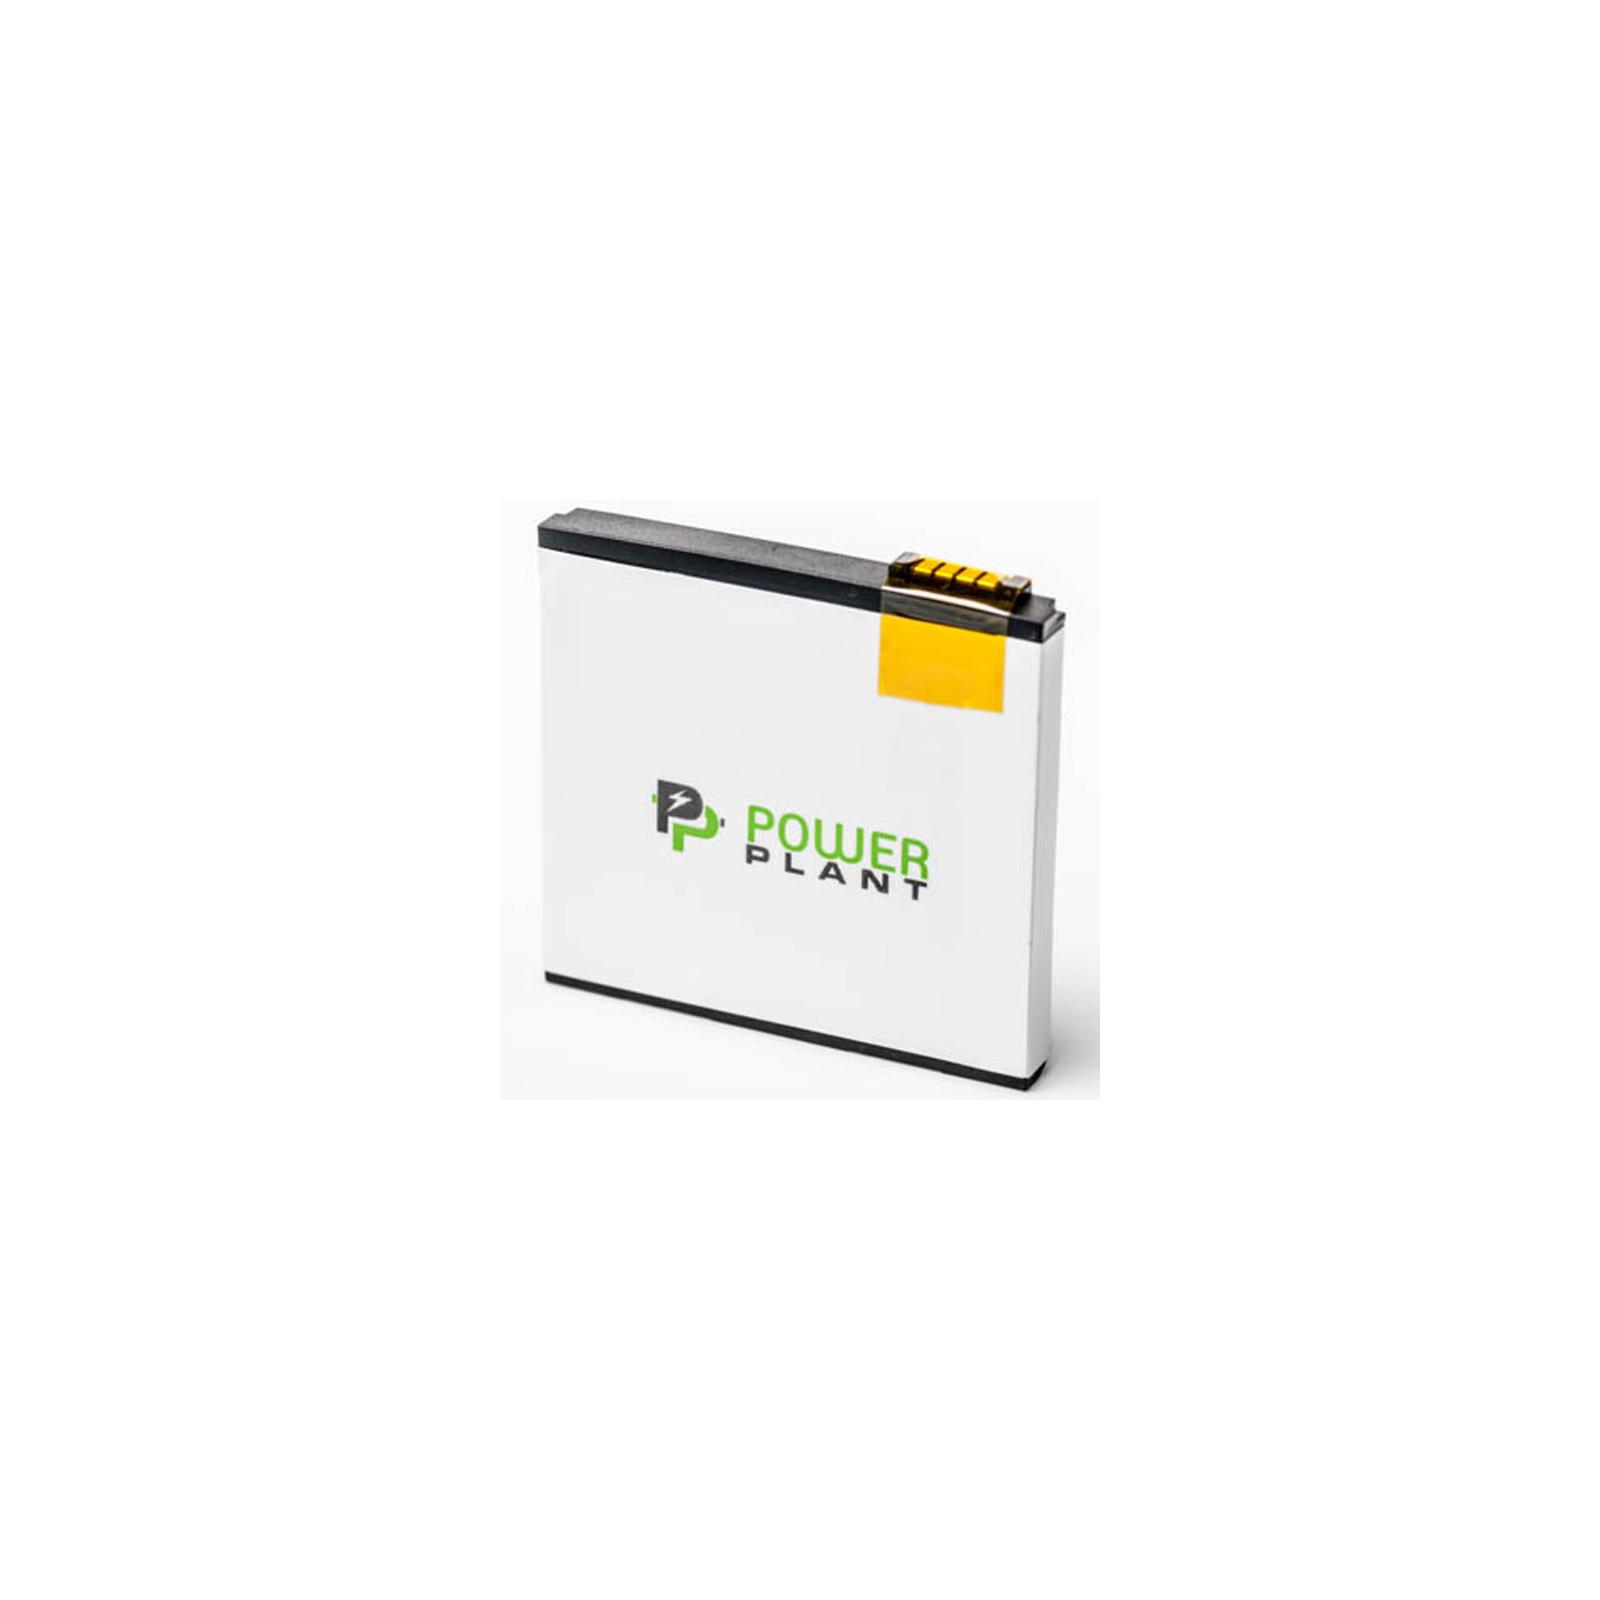 Аккумуляторная батарея PowerPlant Motorola BS6X (XT800, XT800) (DV00DV6134) изображение 2